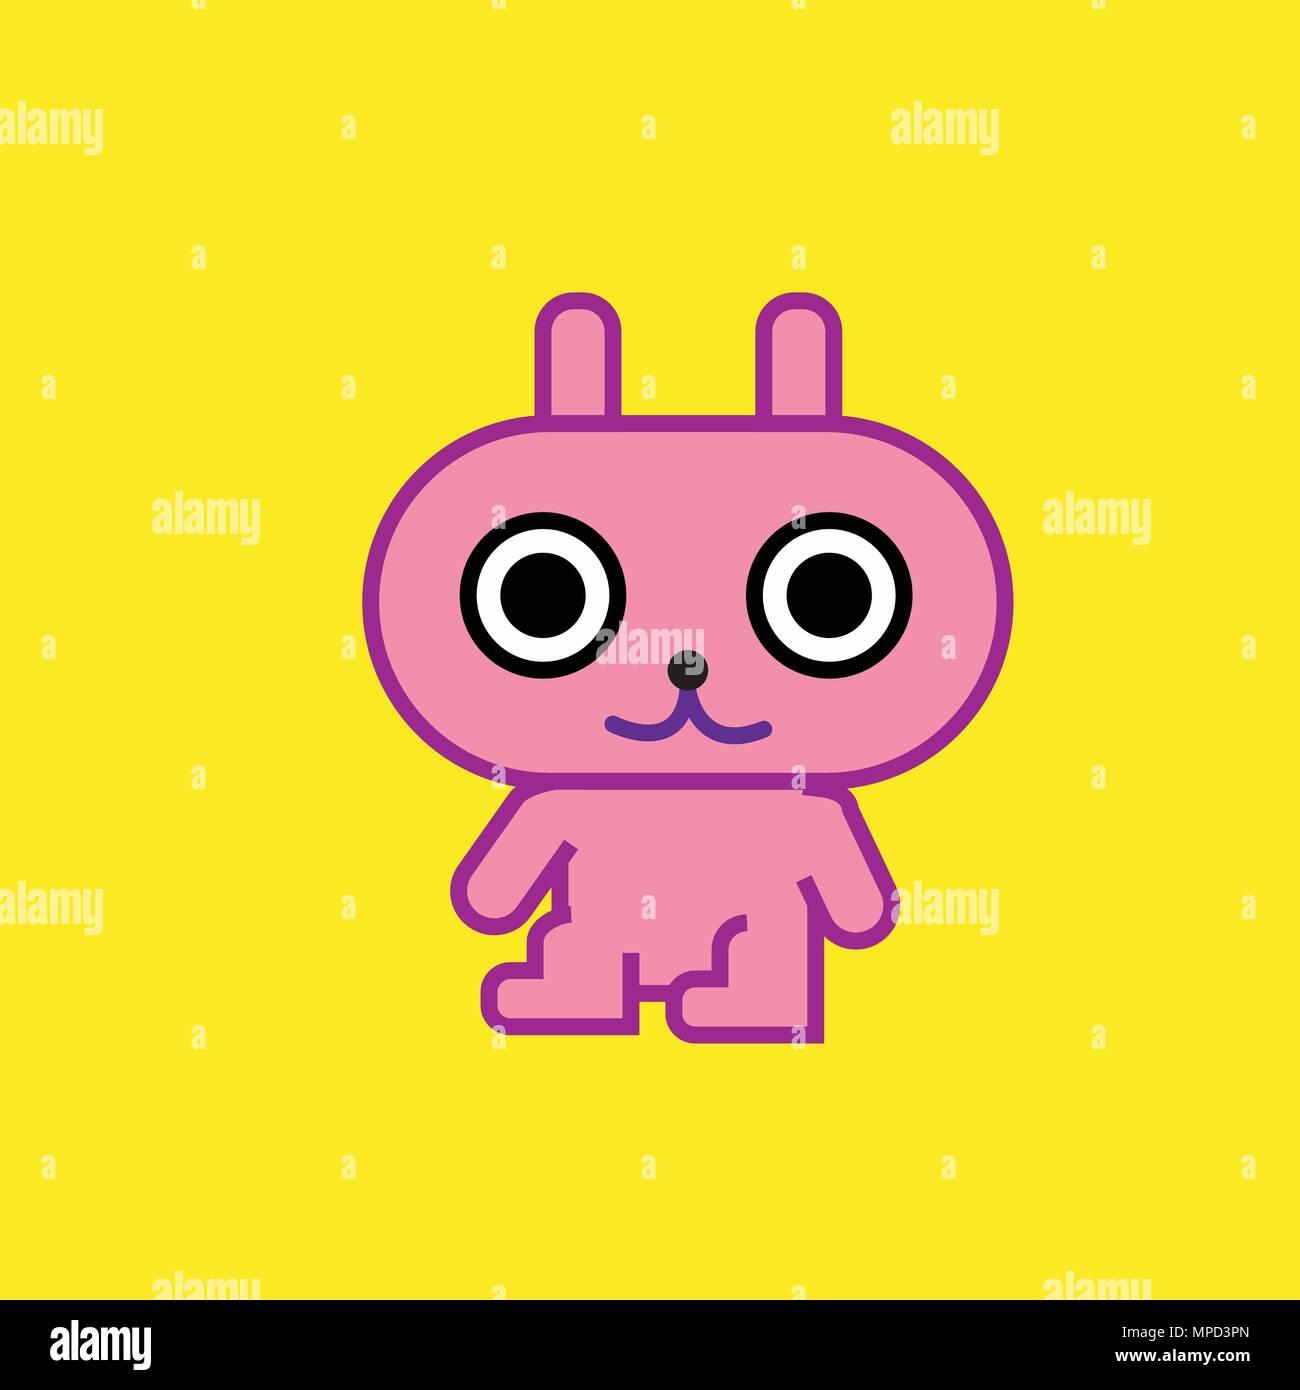 Cute Cartoon Character Pink Rabbit Art With Yellow Background Vector Illustration Kids Rabbit Simple Design Stock Vector Image Art Alamy